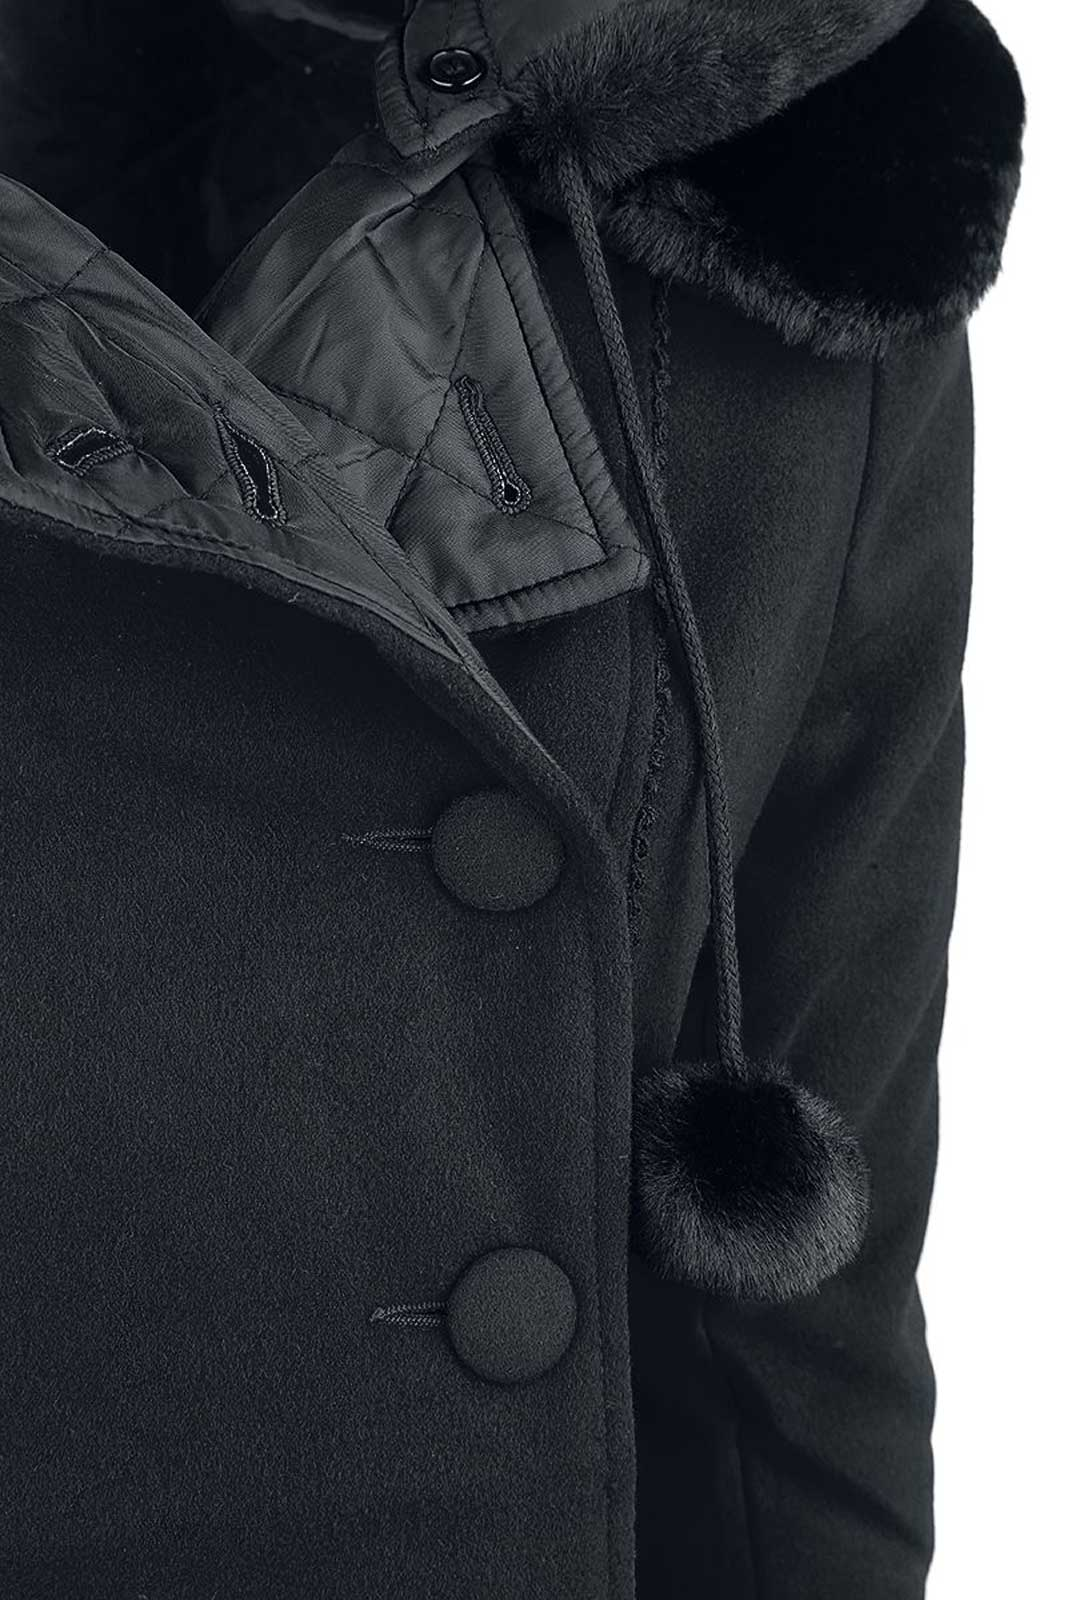 Sarah Jane Coat Black Close Up